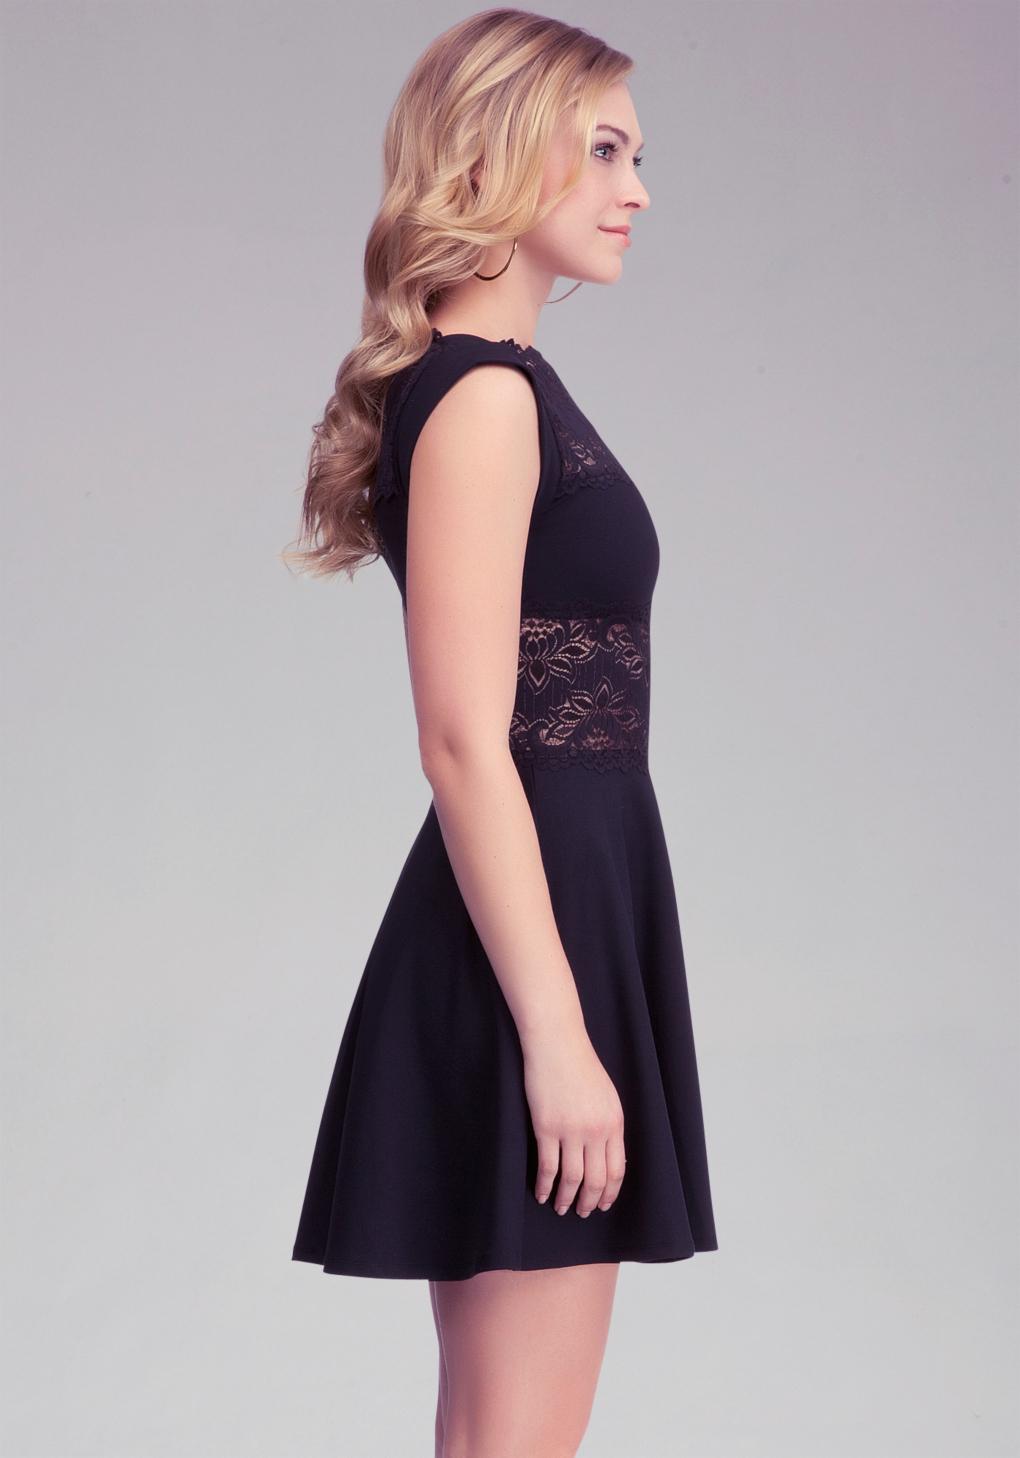 Lyst Bebe Lace Panel Midriff Dress In Black